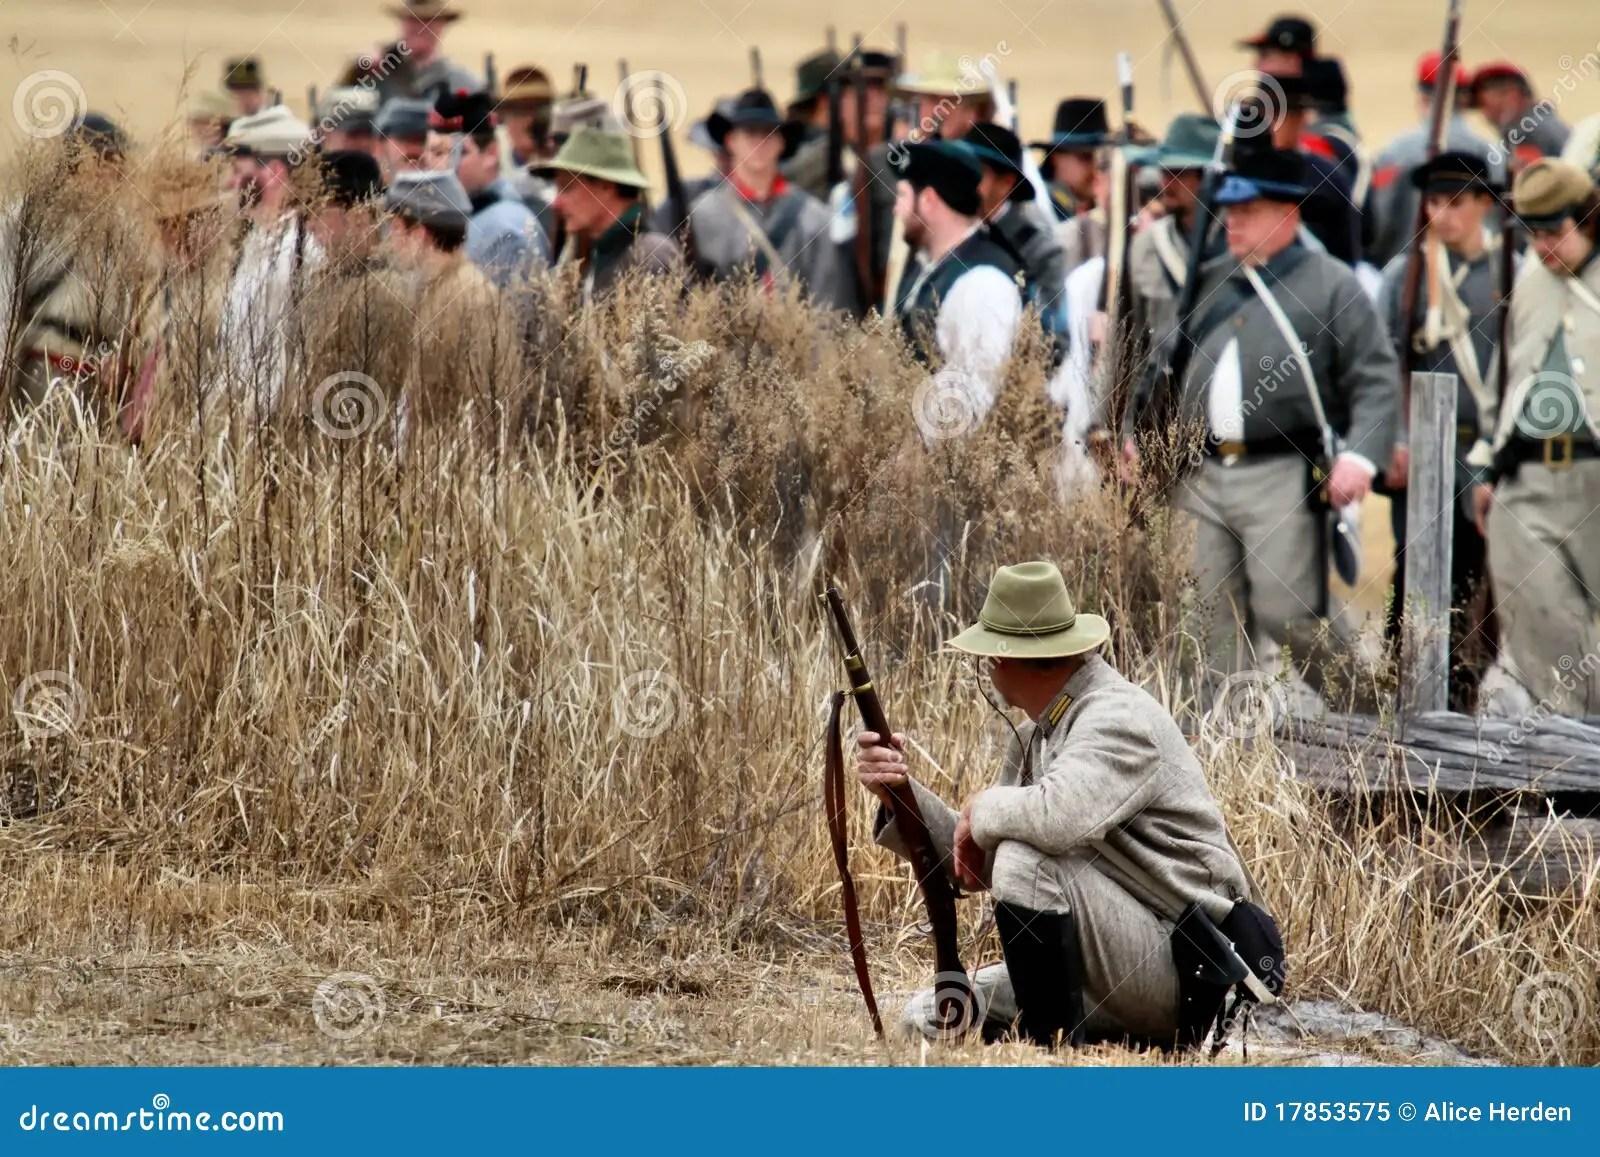 Brooksville Raid Re-enactment Editorial Image - Image of rifles. enactment: 17853575